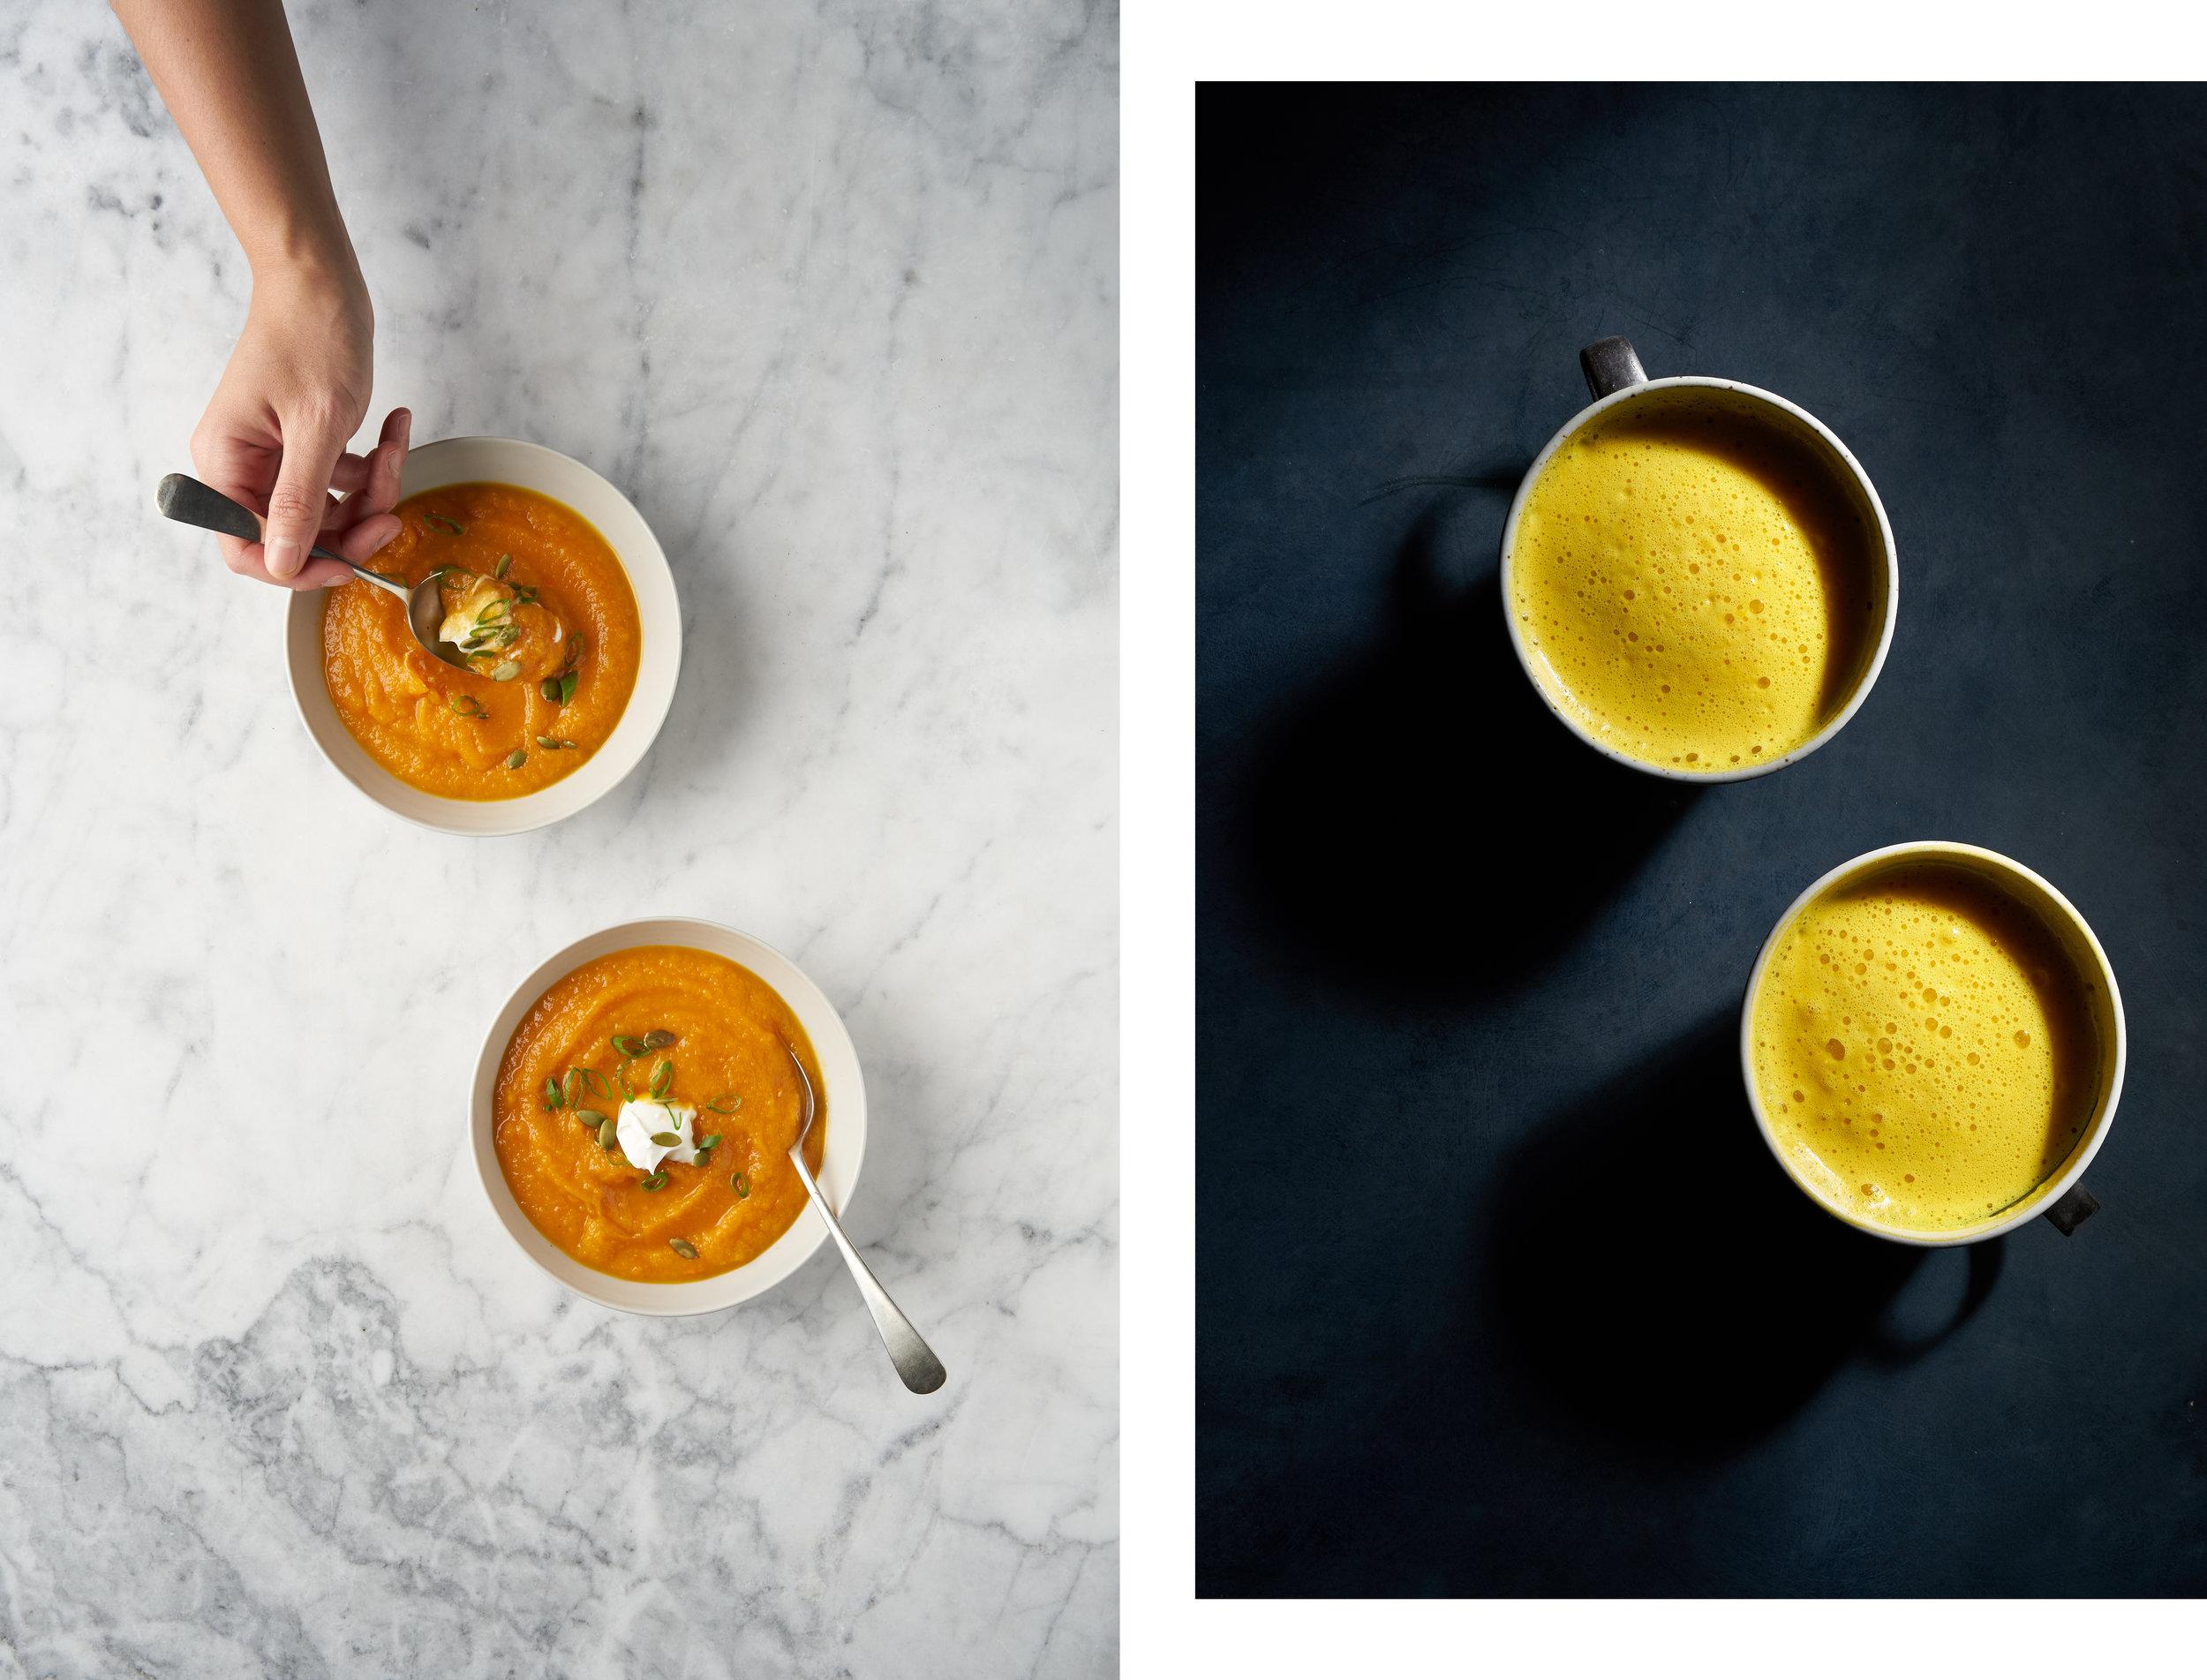 Soup-and-golden-milk.jpg